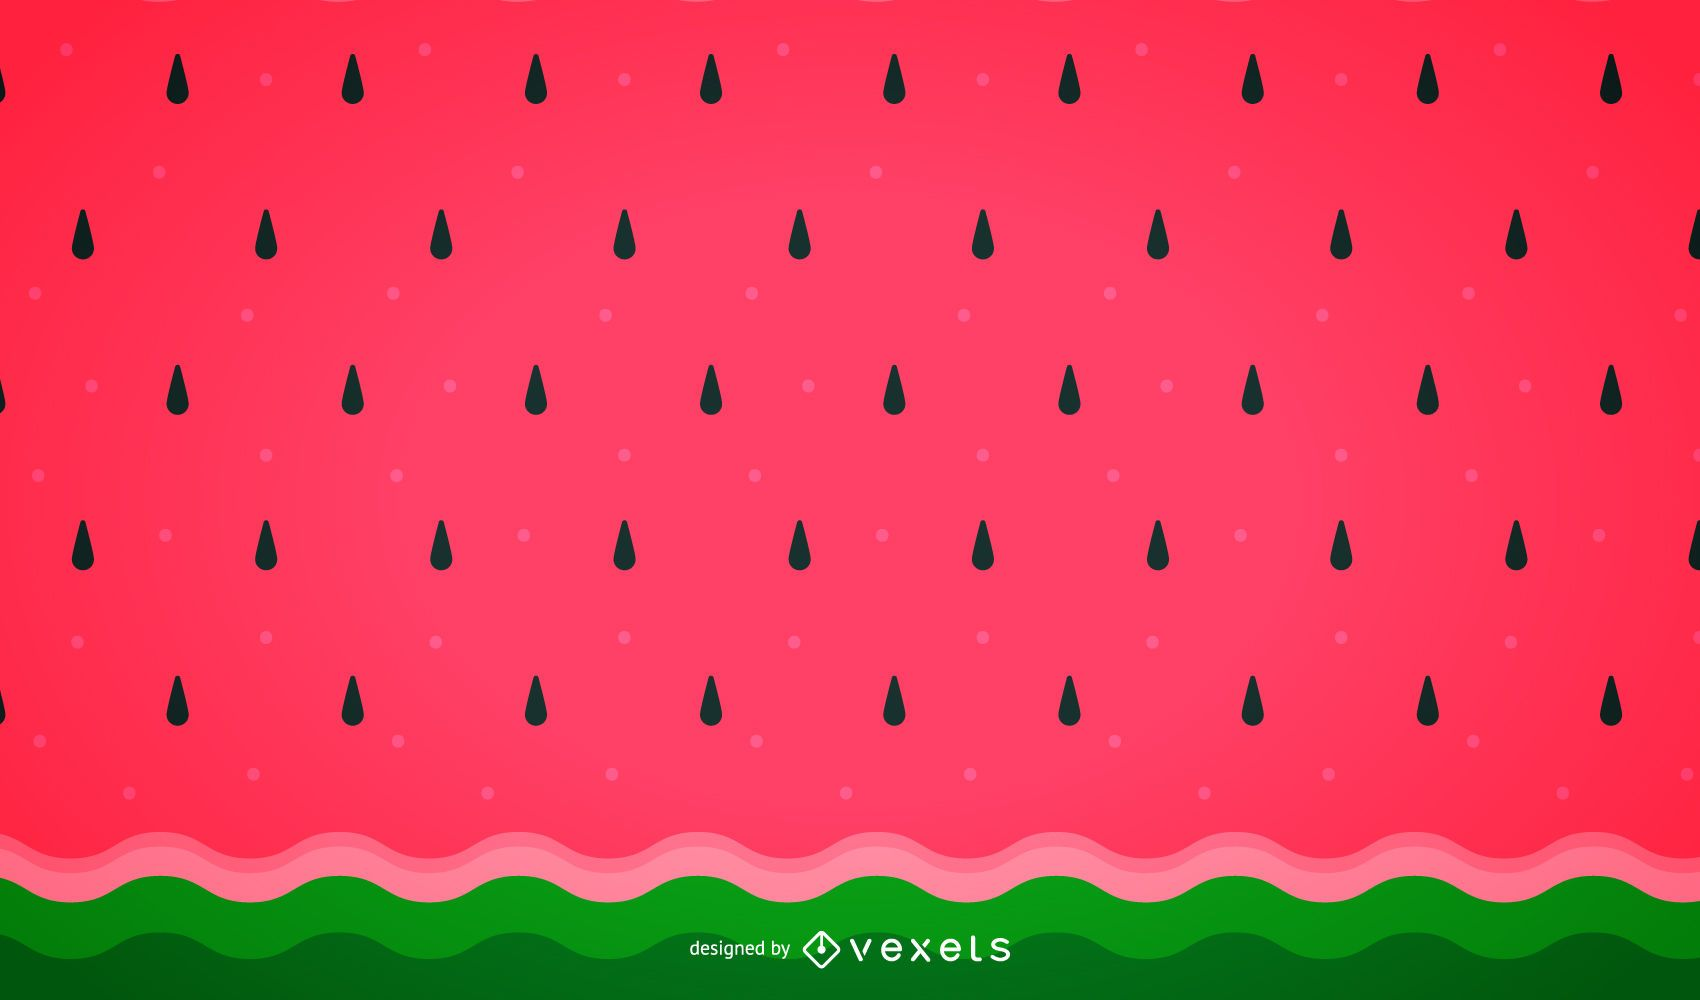 Watermelon Wallpaper Cute One Minimalist Watermelon Background Pattern Vector Download